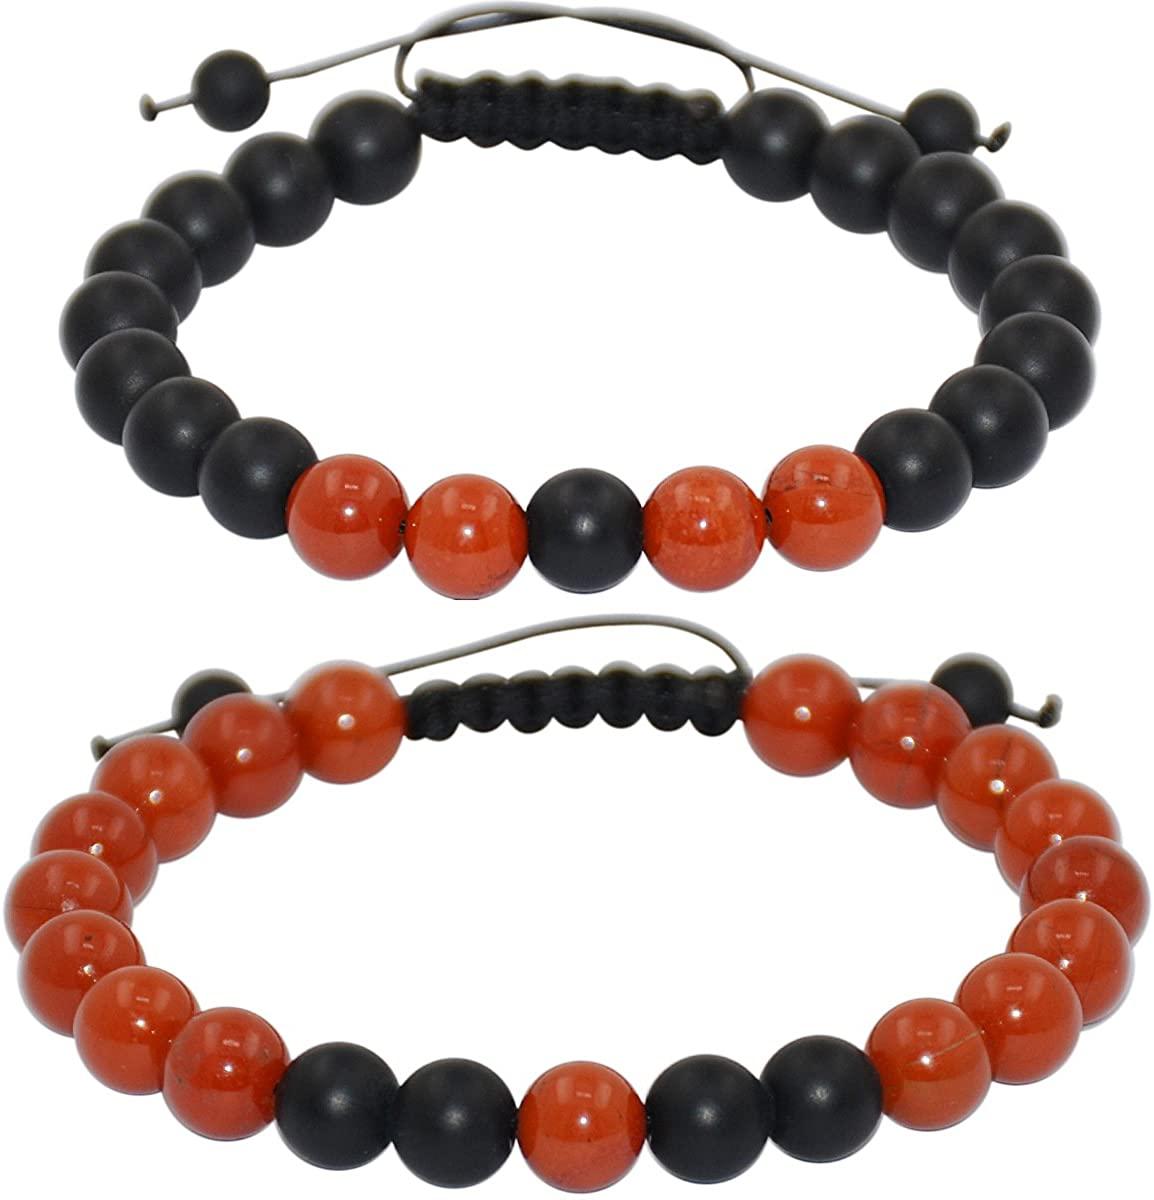 Massive Beads Friendship Relationship Couples Distance Adjustable Round Beads Bracelet Gems& Jewelry Box